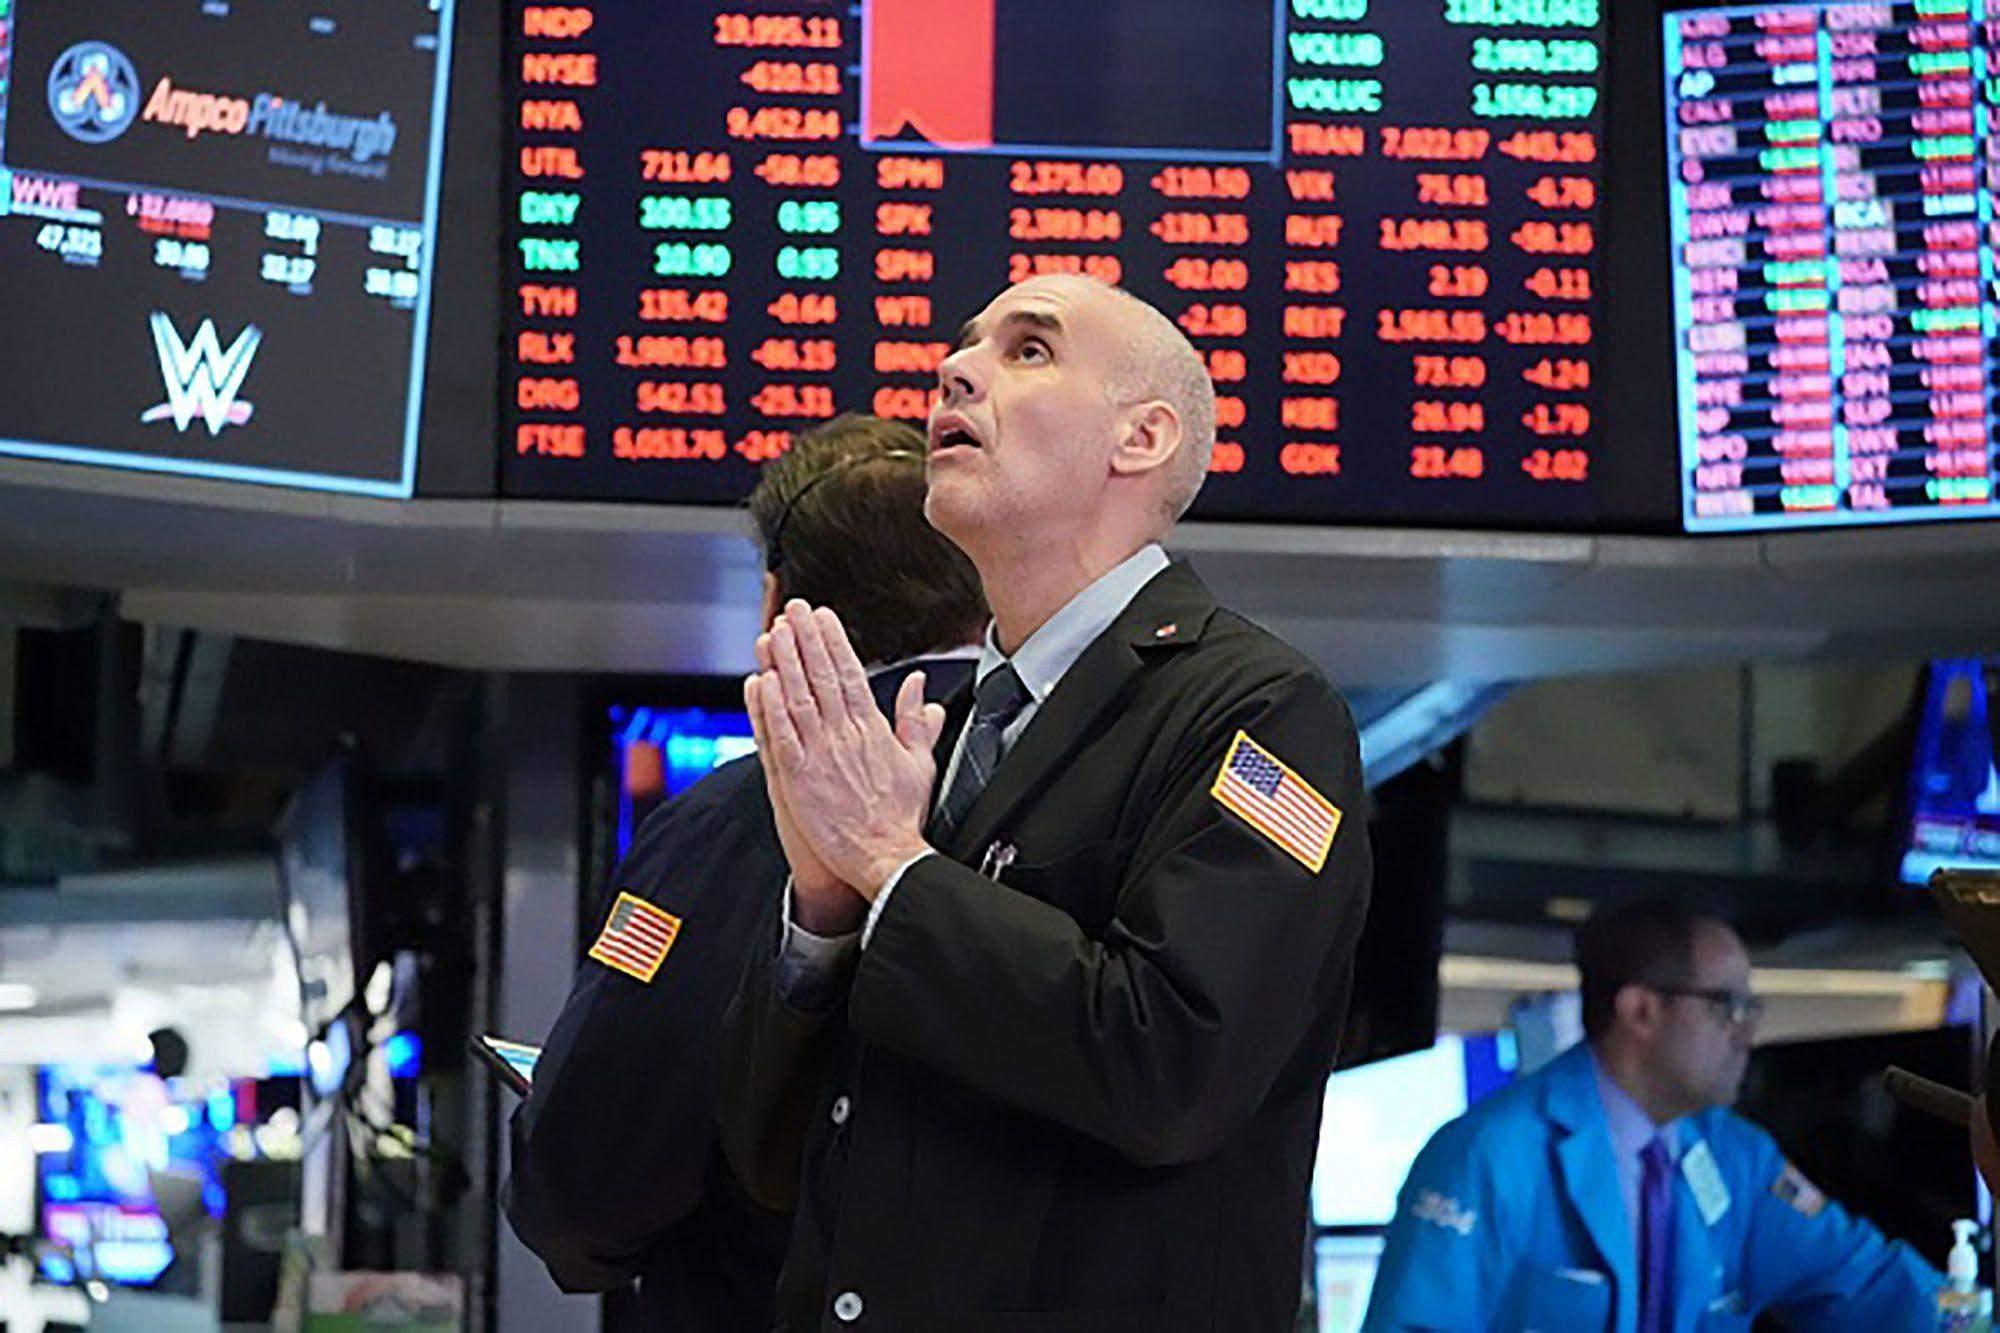 обвал фондових бірж